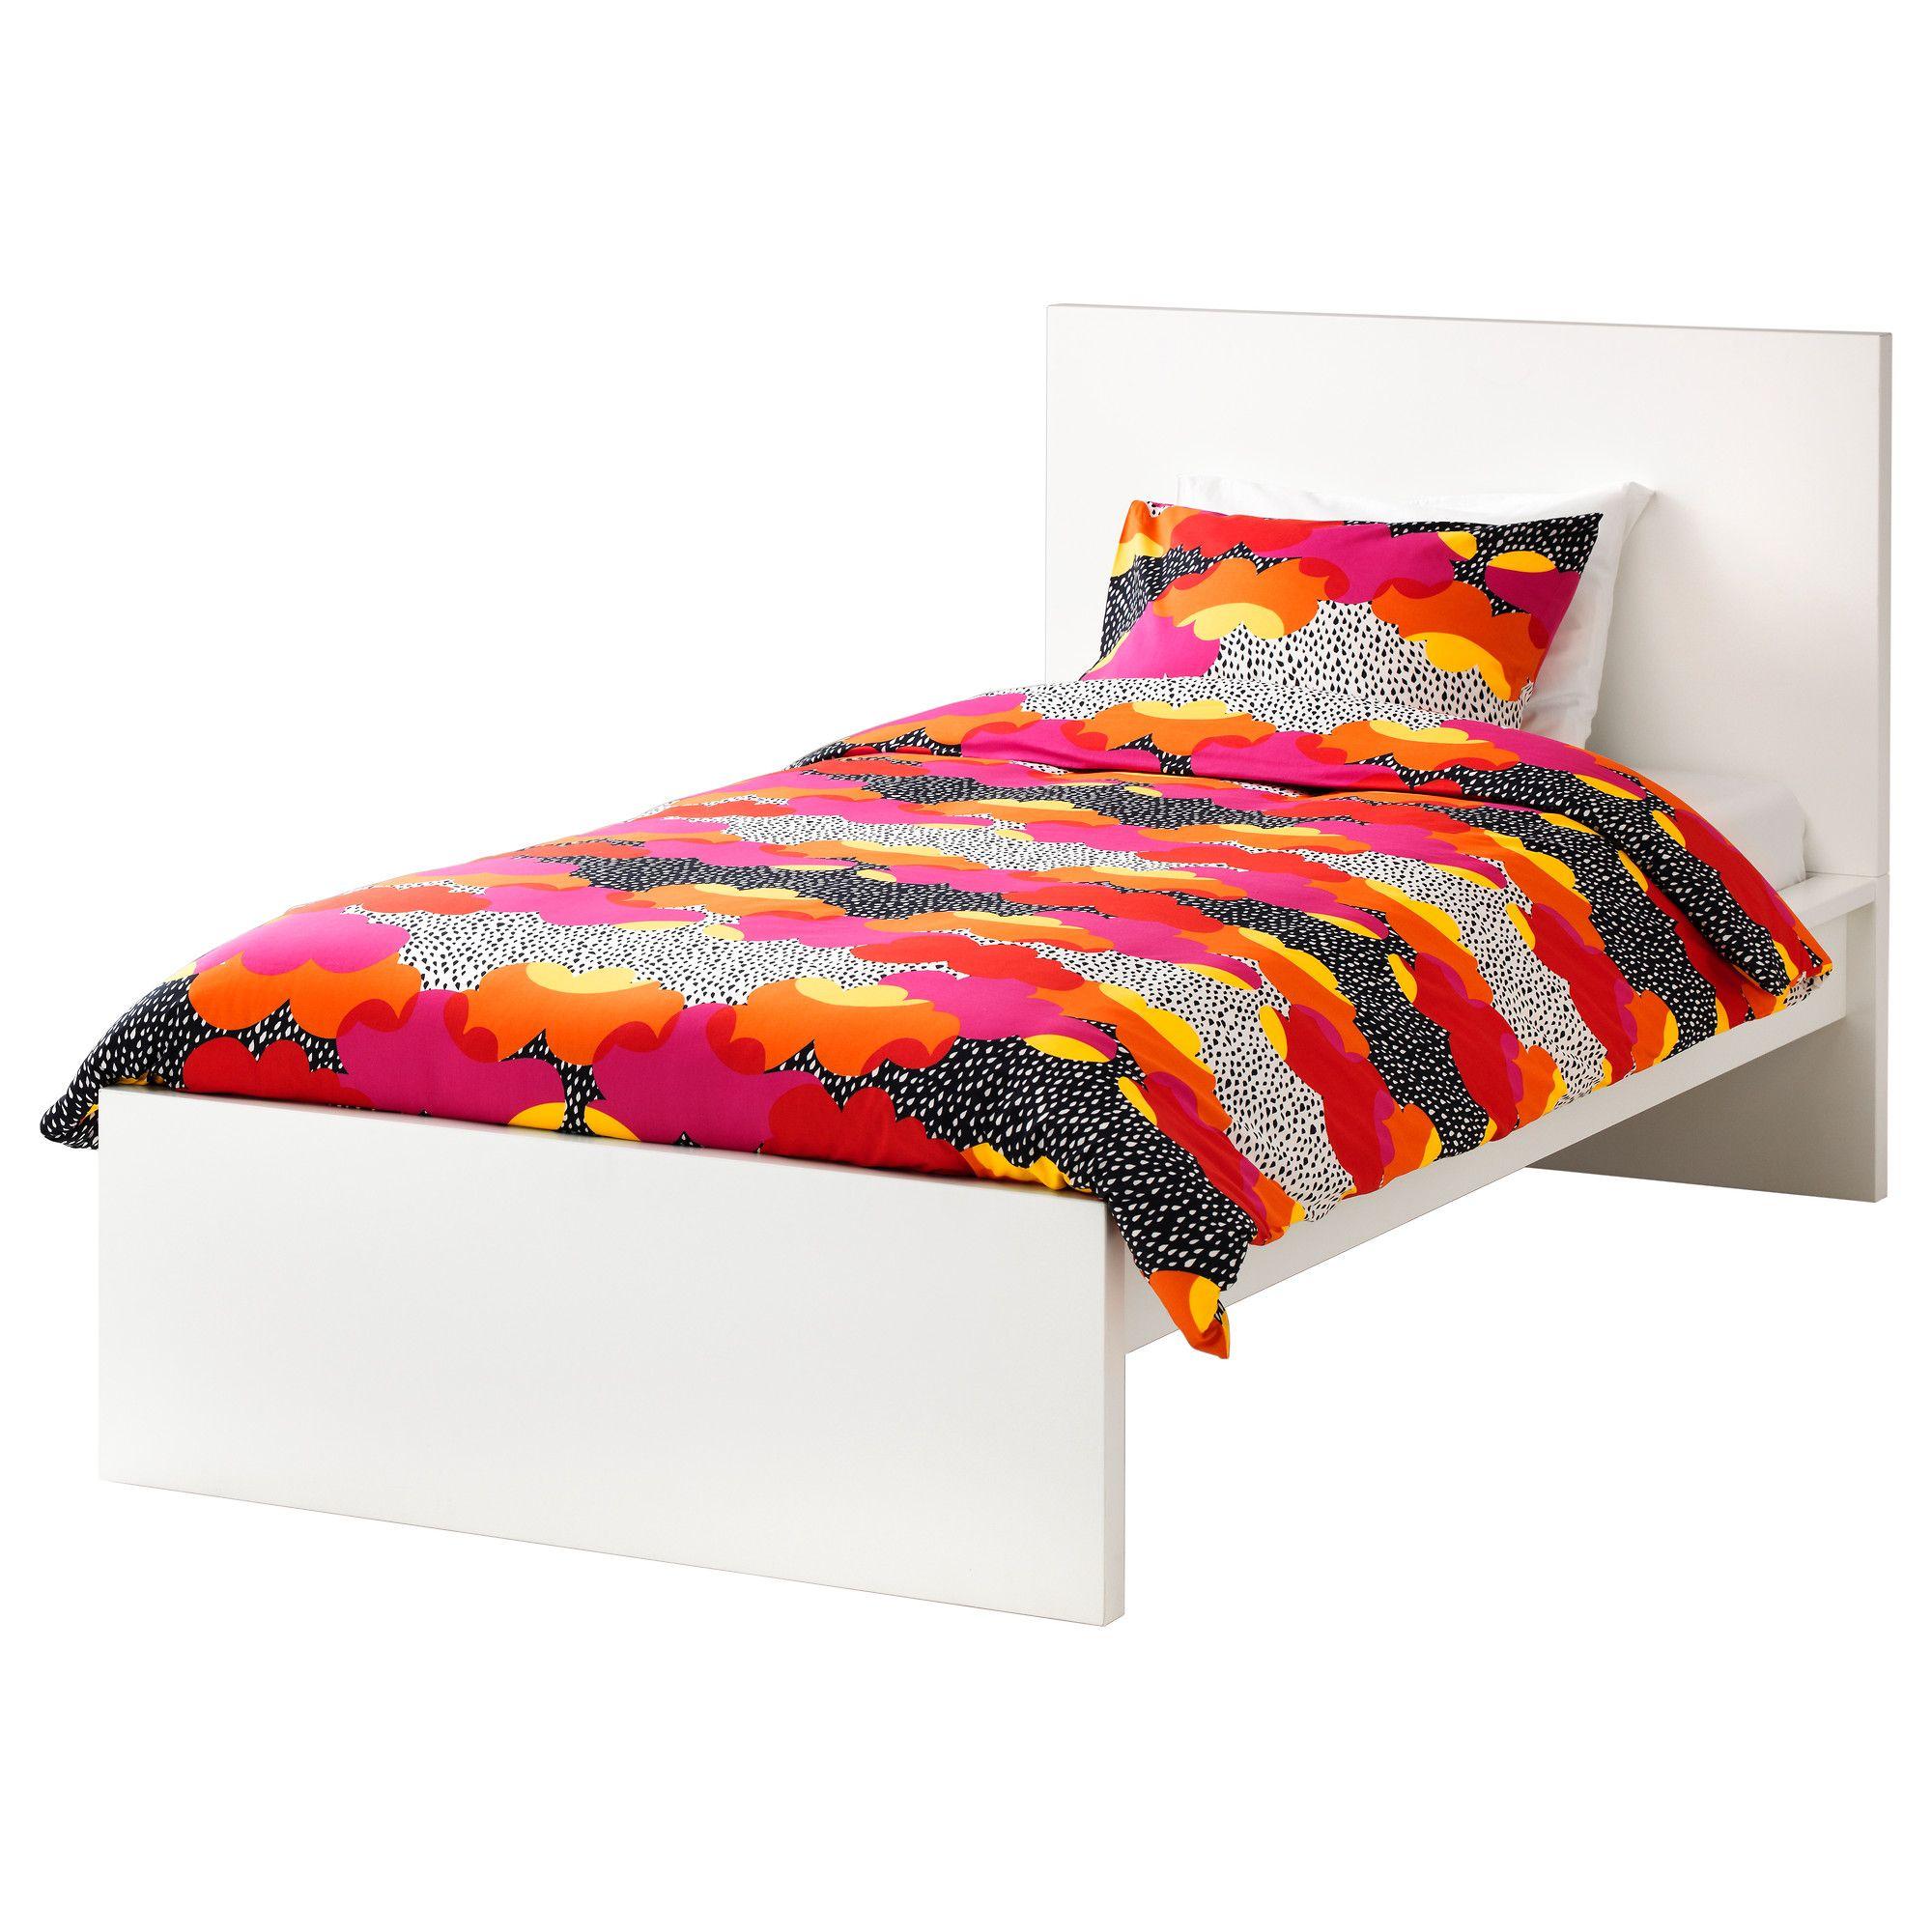 MALM Bed frame, high White/luröy Standard Single | Malm bed frame ...